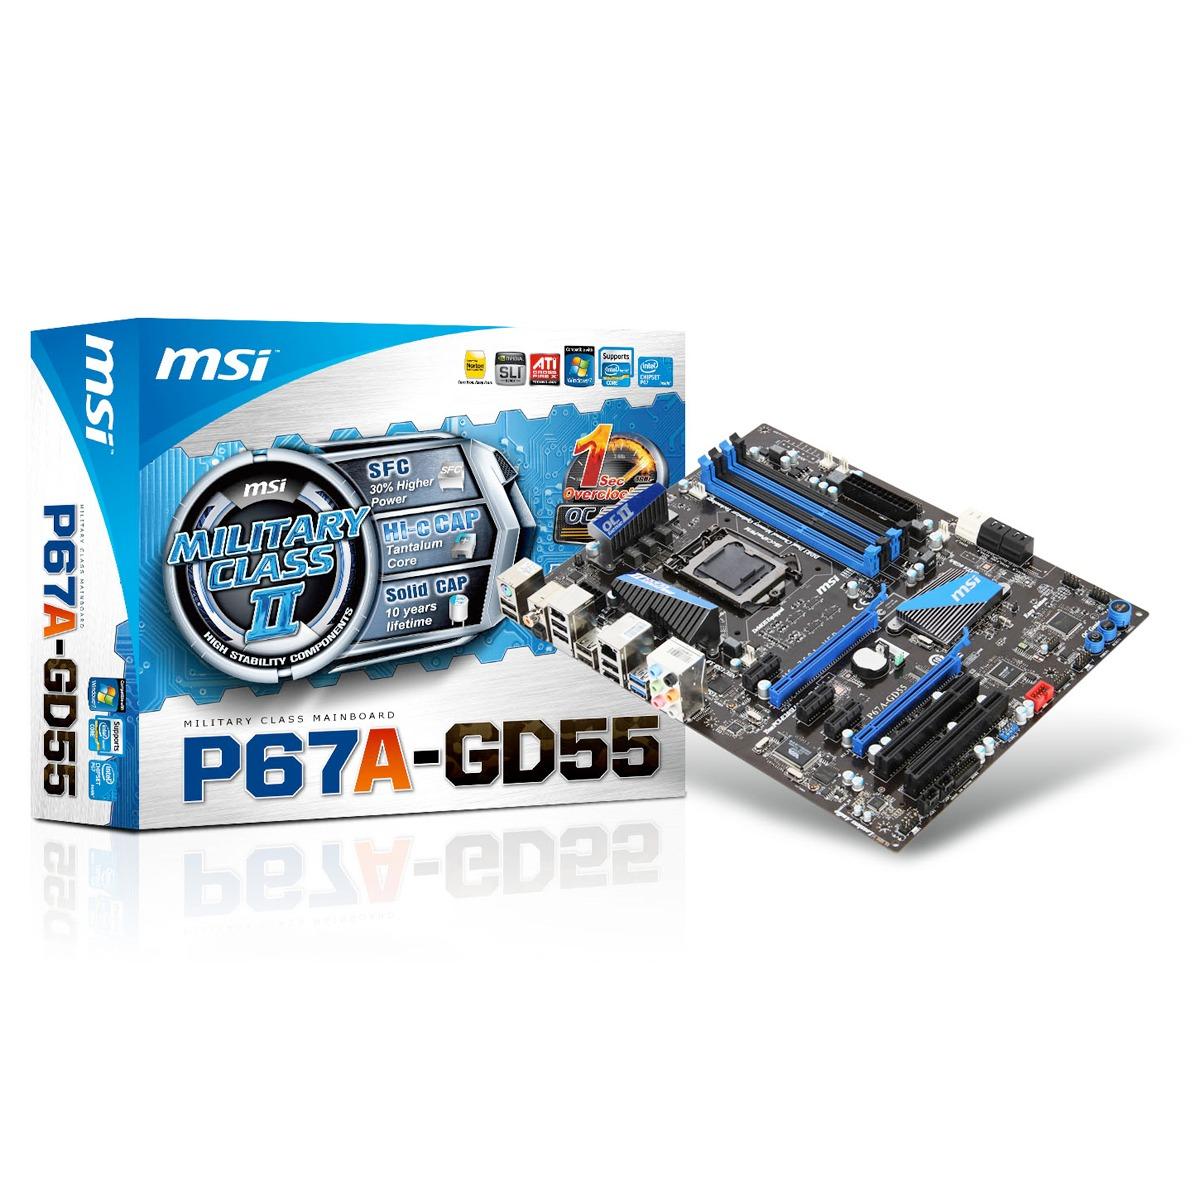 Carte mère MSI P67A-GD55 (Rev. B3) Carte mère ATX Socket 1155 Intel P67 Express Revision B3